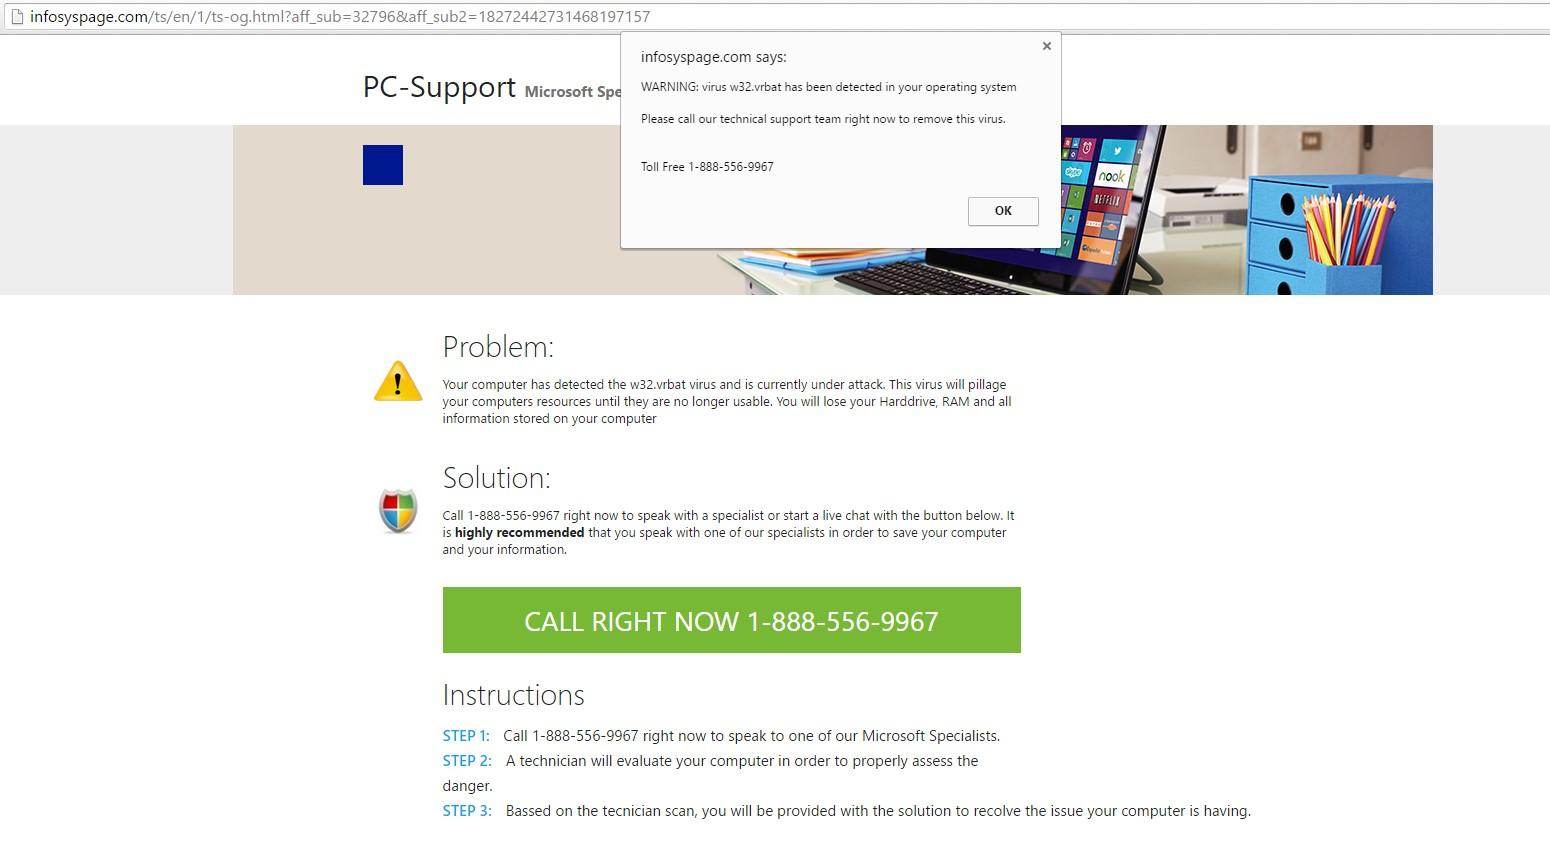 infosyspage.com